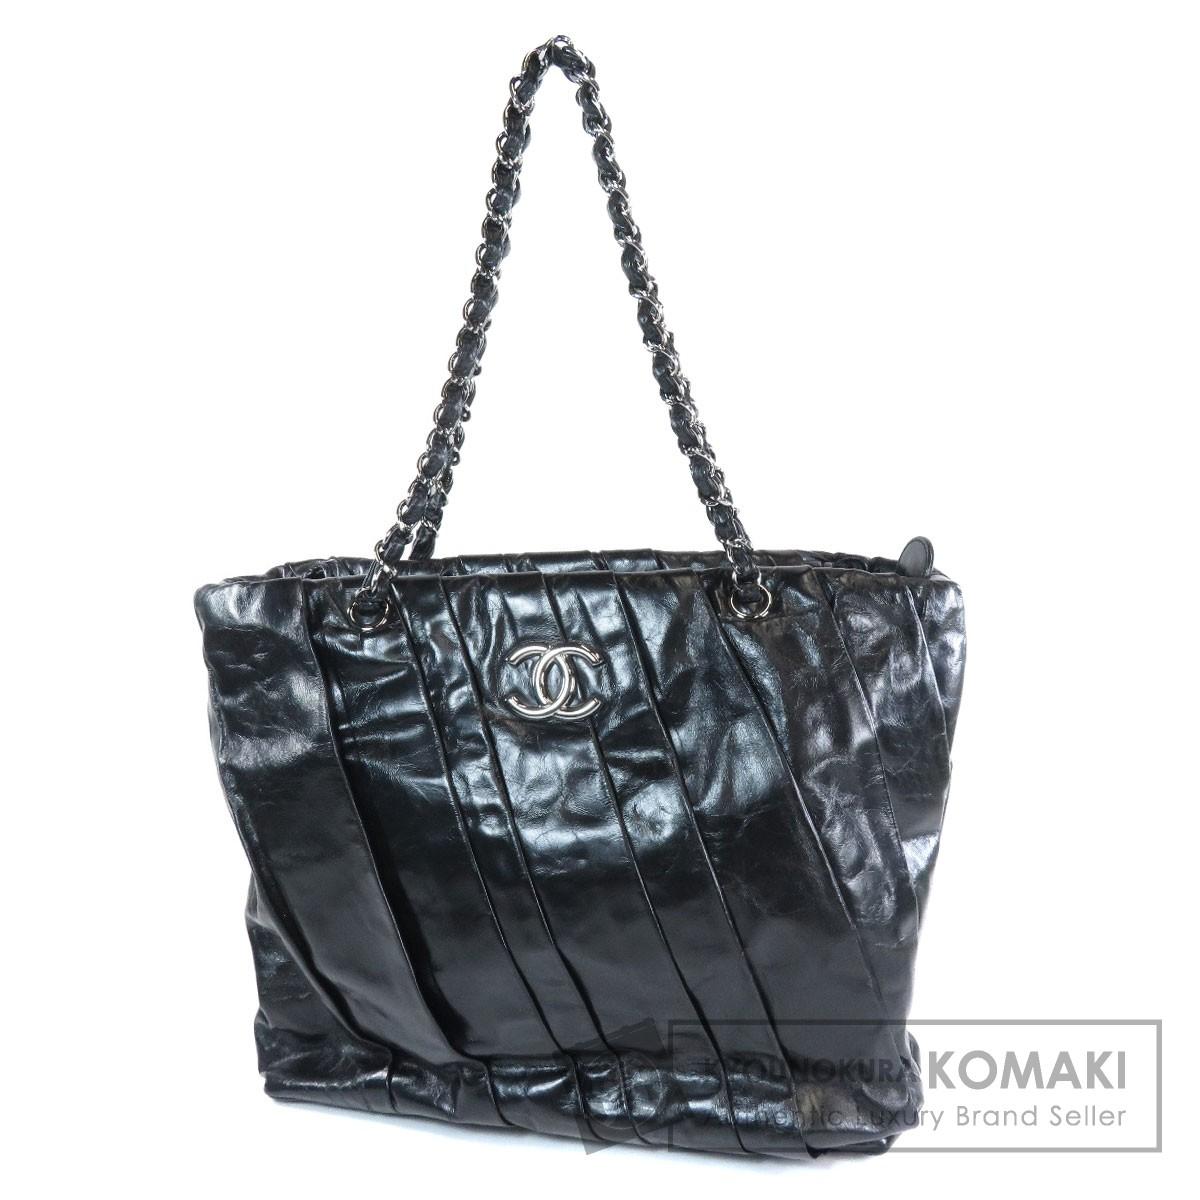 6faae7d069 Kyonokura Komaki Brand Cheapest Challenger: Authentic CHANEL ...